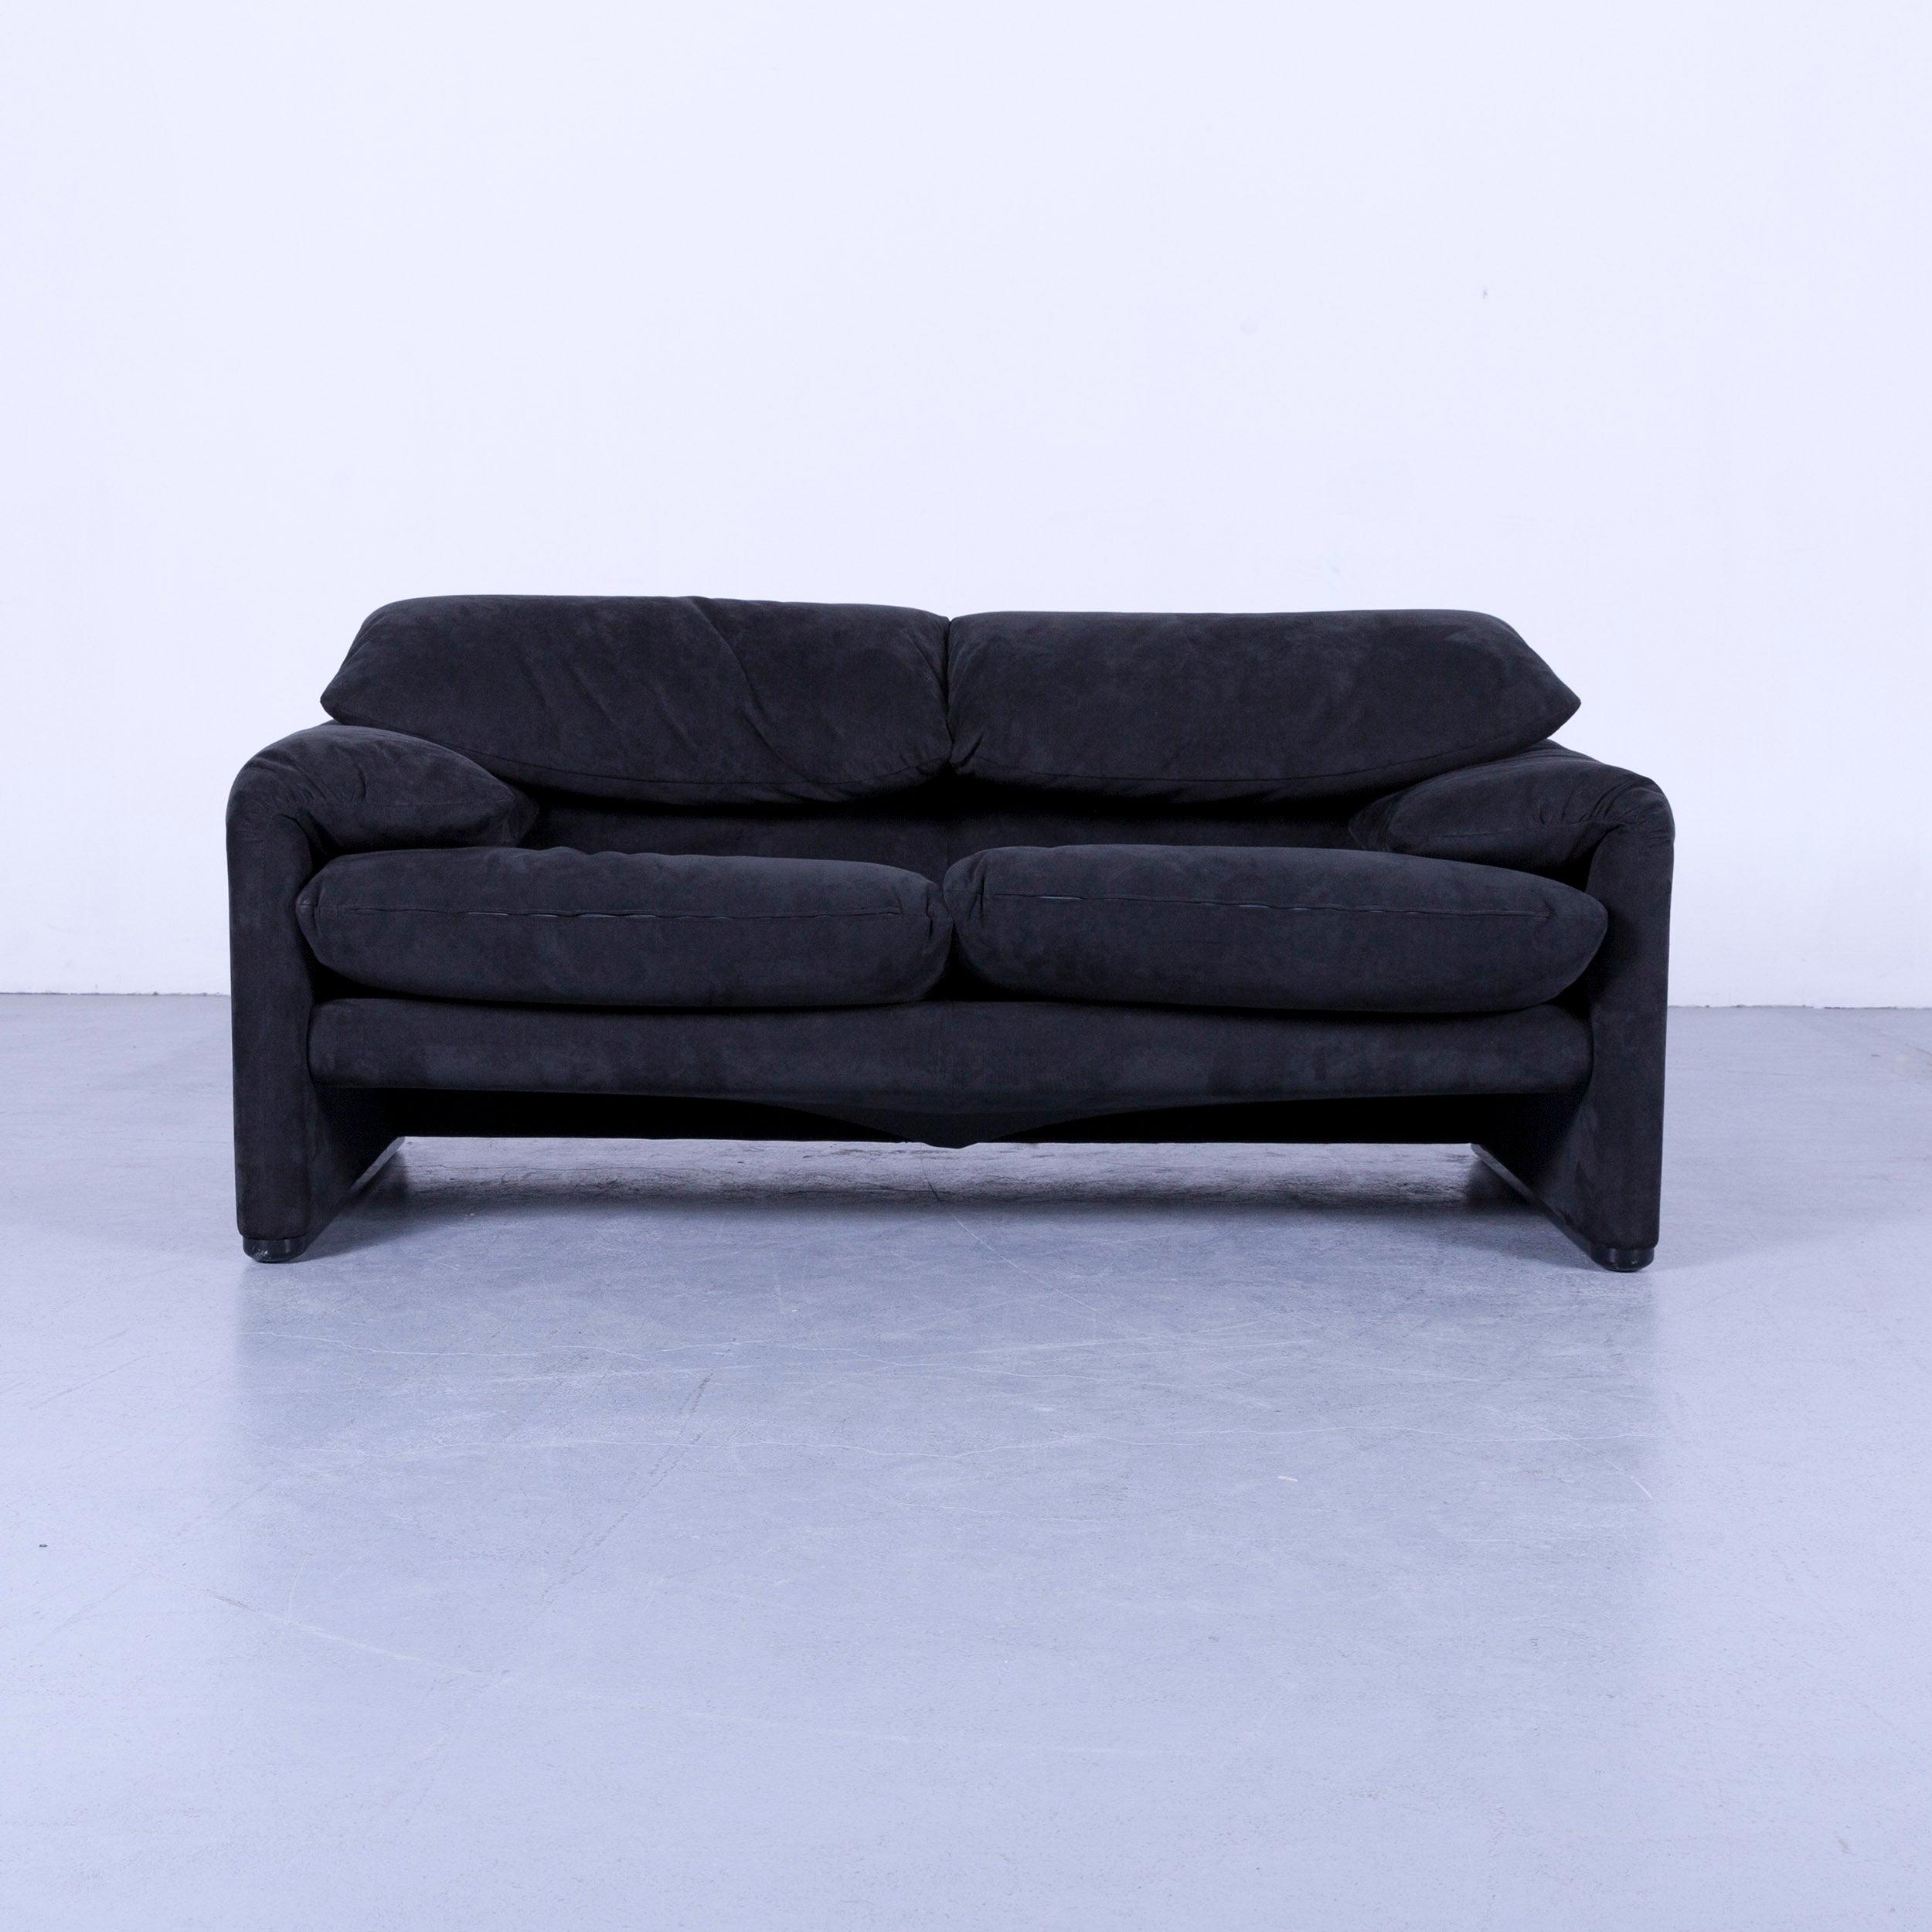 Sofa Alcantara cassina maralunga designer sofa black alcantara two seat function